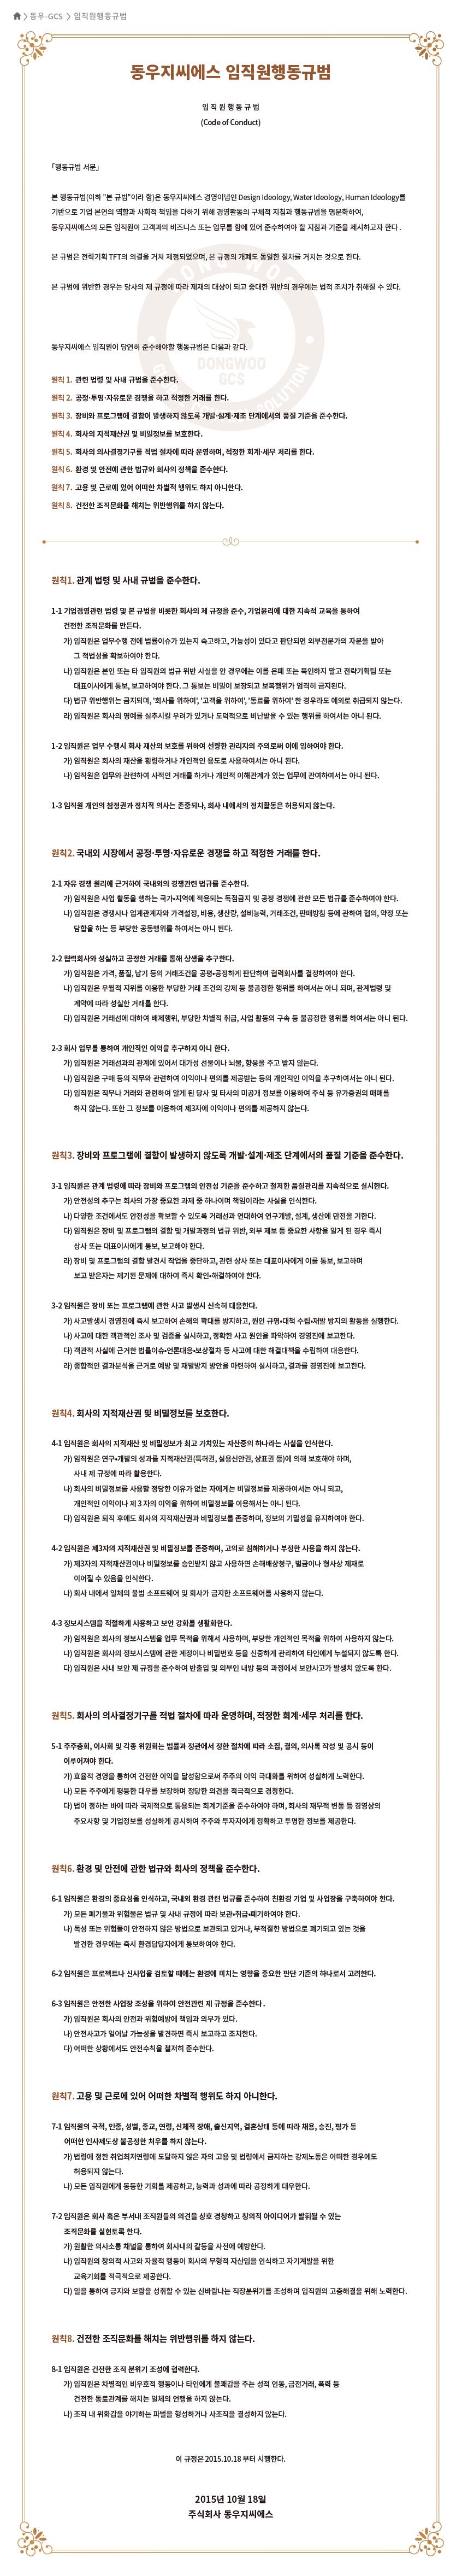 DWGCS_HOME_임직원행동규범_로고 수정.jpg